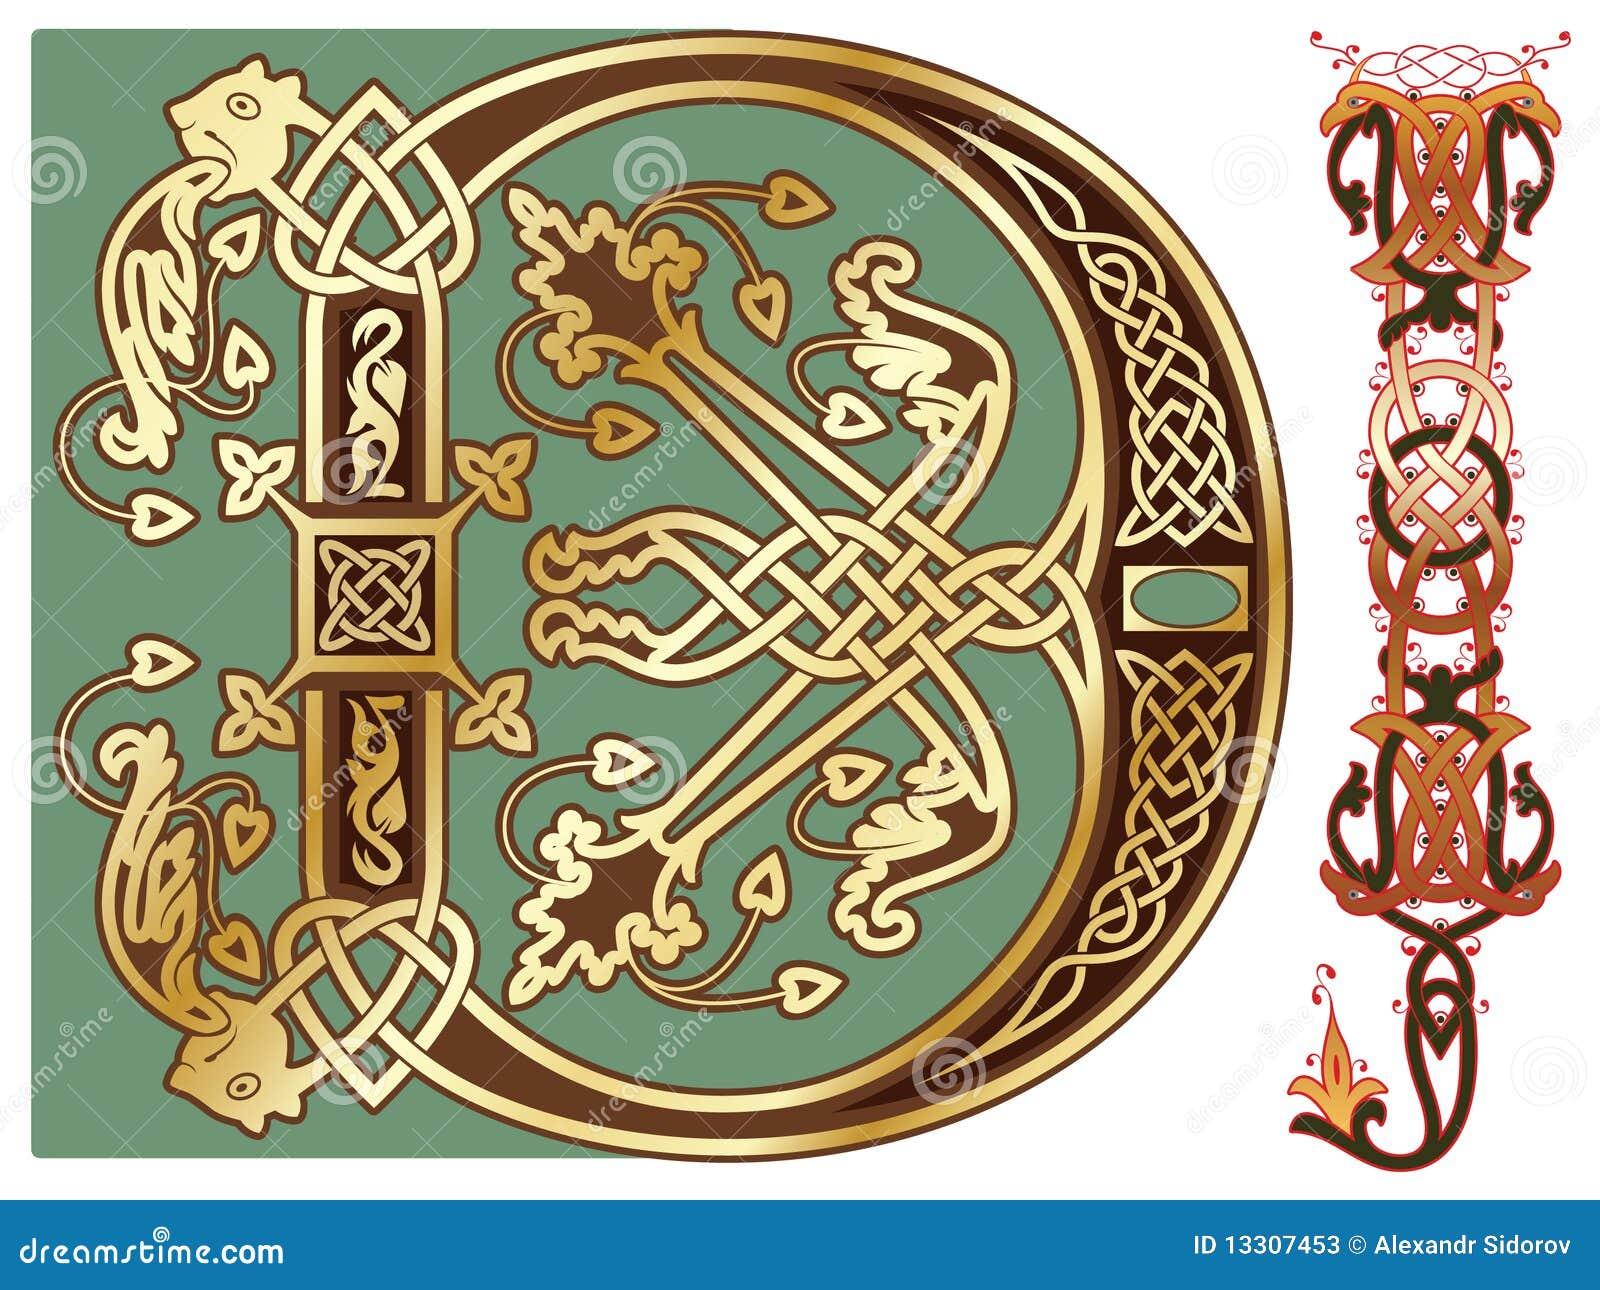 celtic birthday image